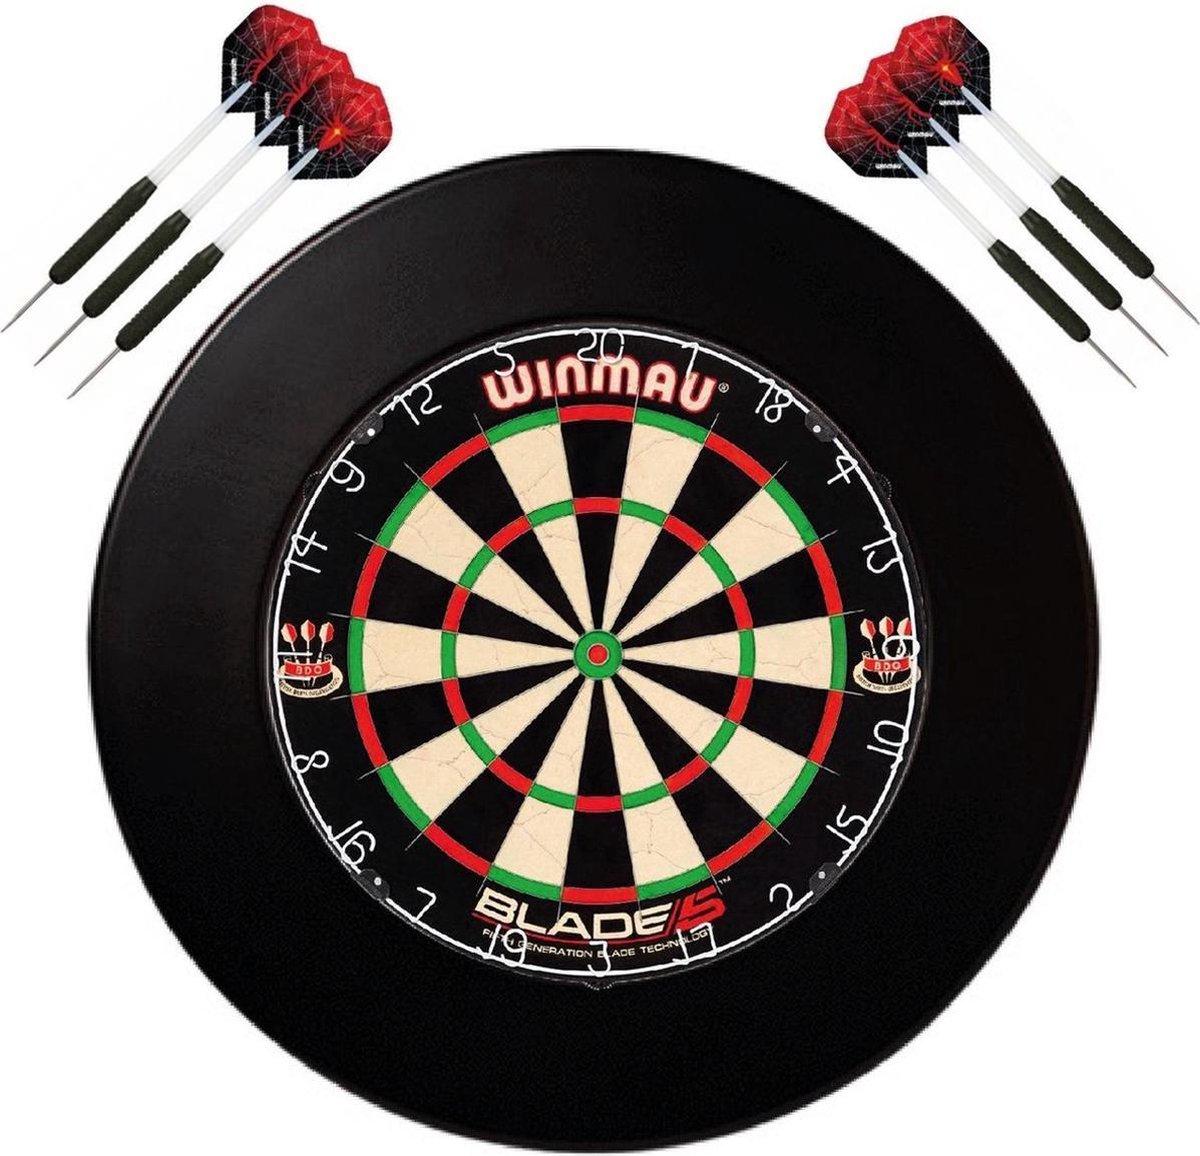 Winmau set - Winmau Blade 5 - dartbord - plus surround ring zwart - plus 2 sets - dartpijlen